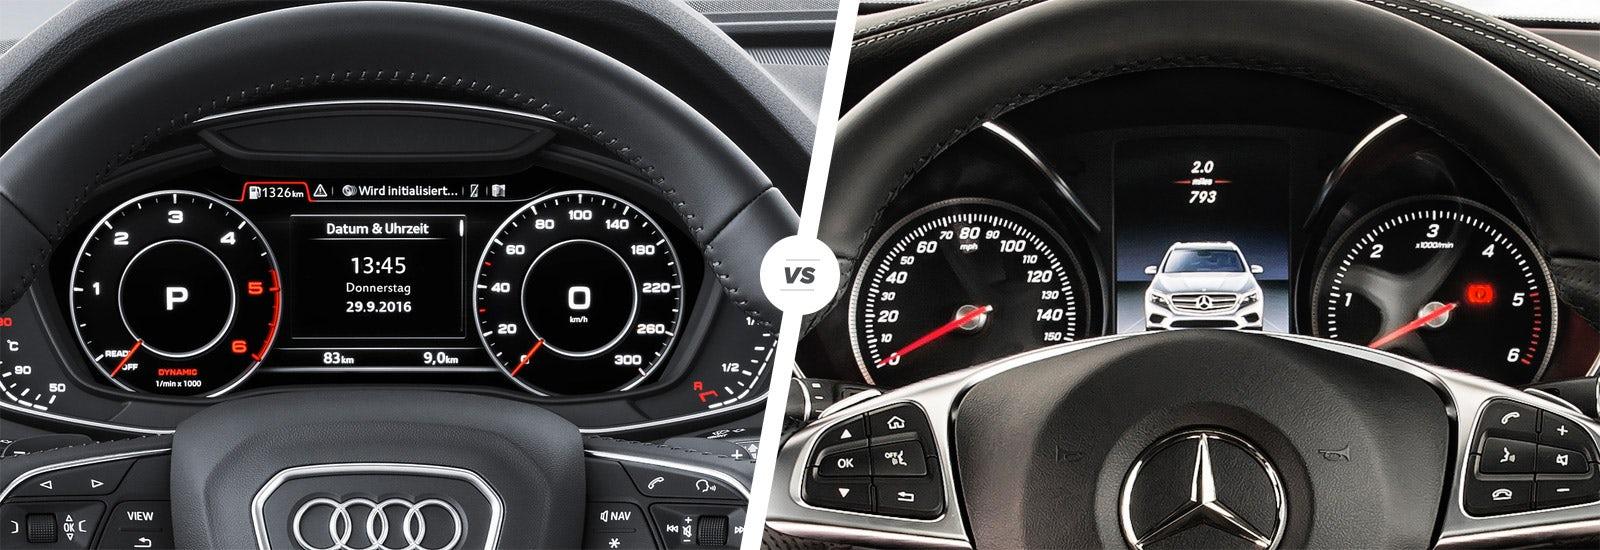 Audi Q5 Vs Mercedes Glc Engines